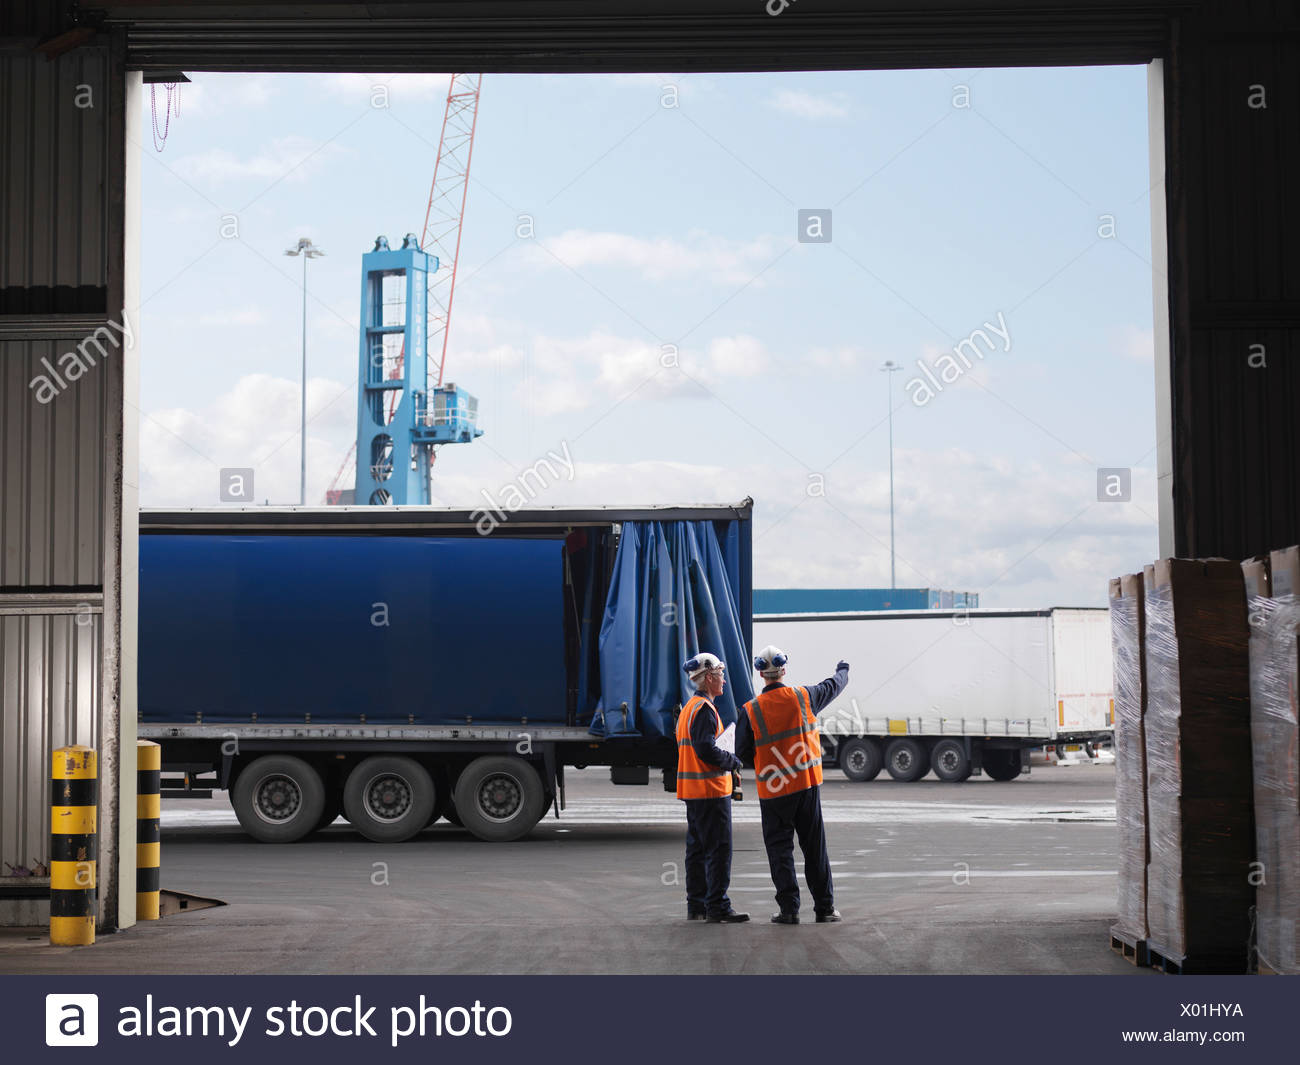 Port Workers Organizing Lorries - Stock Image